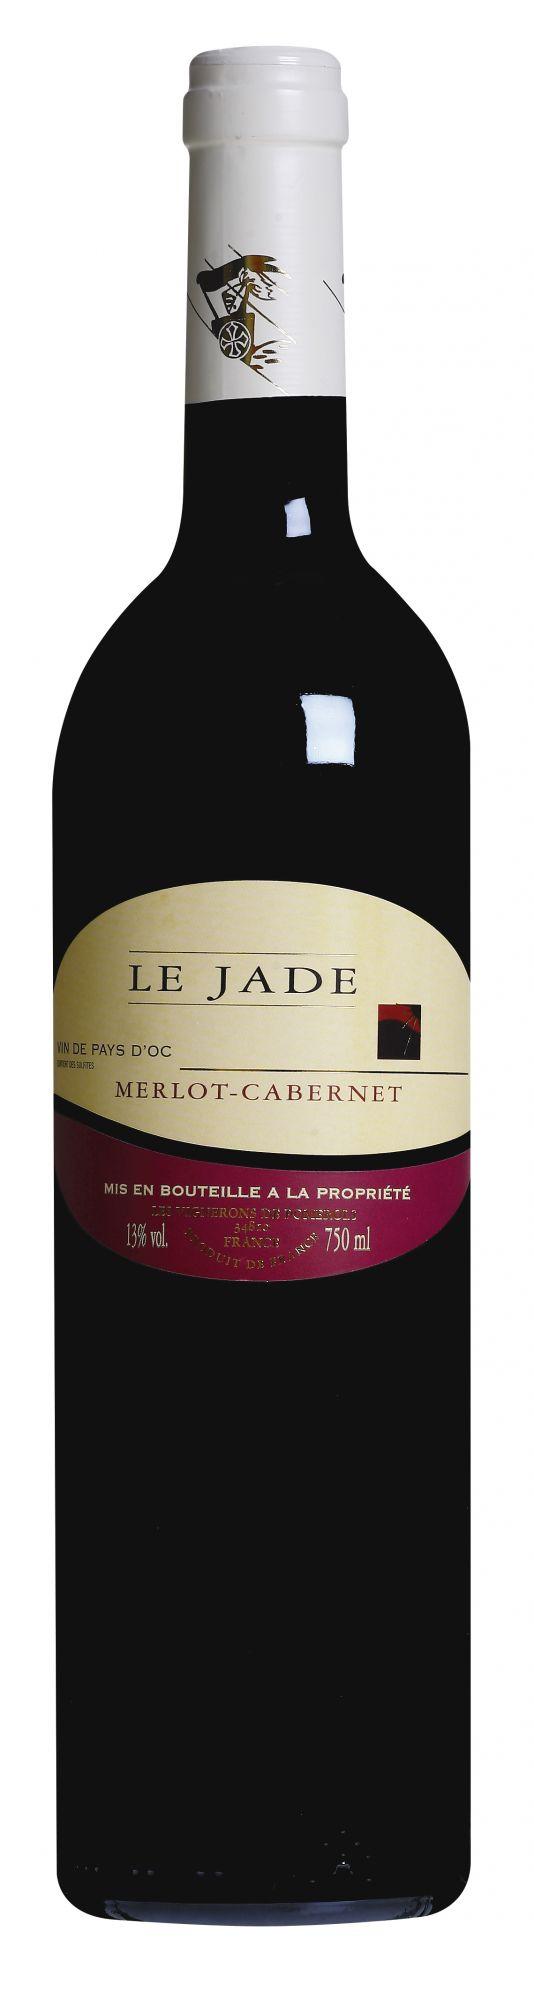 Le Jade Pays d'Oc Merlot-Cabernet